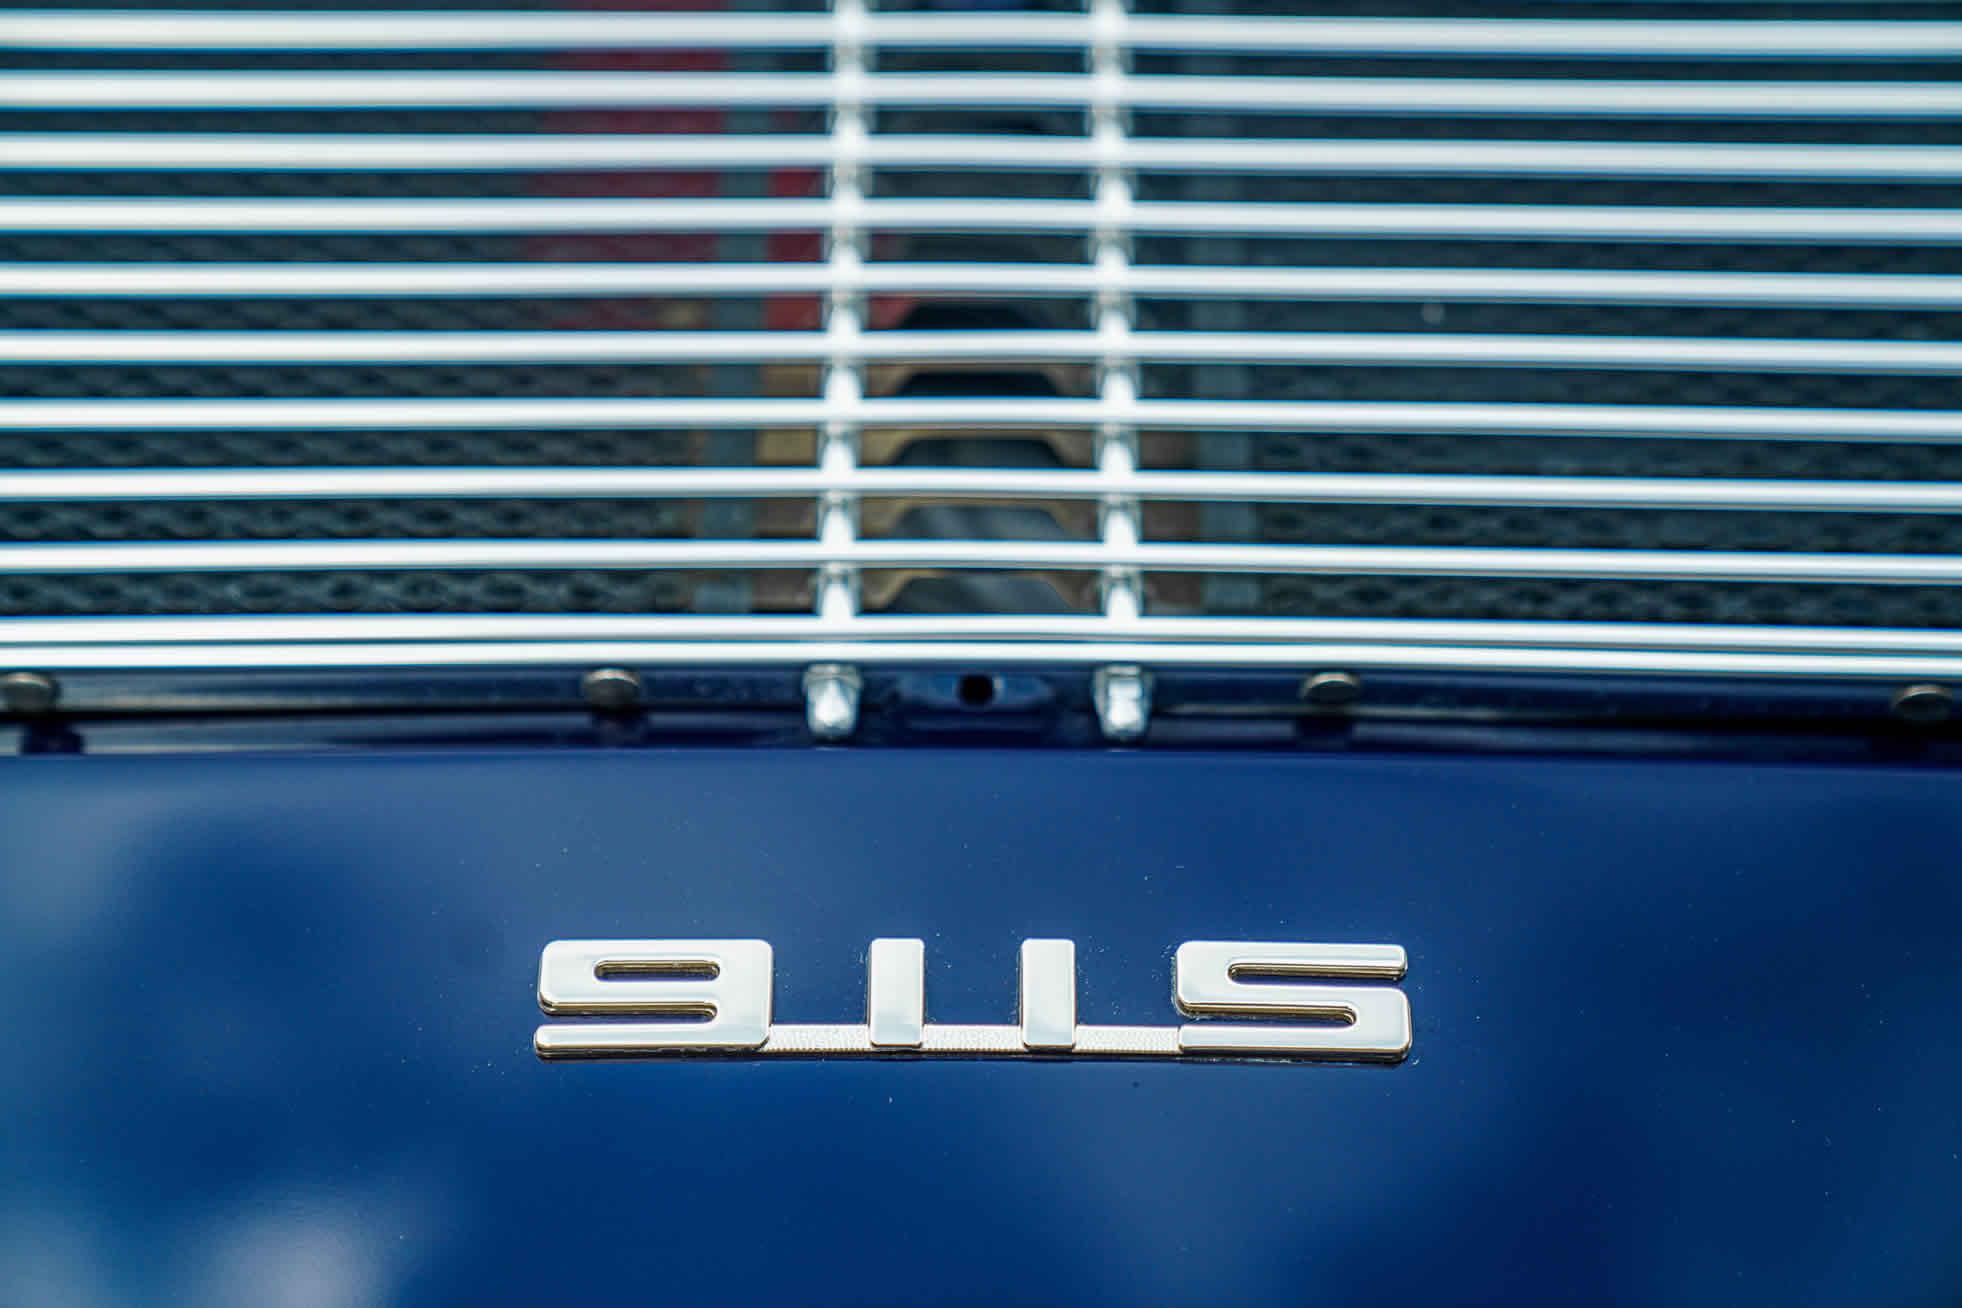 1968 Porsche 911 S For Sale.